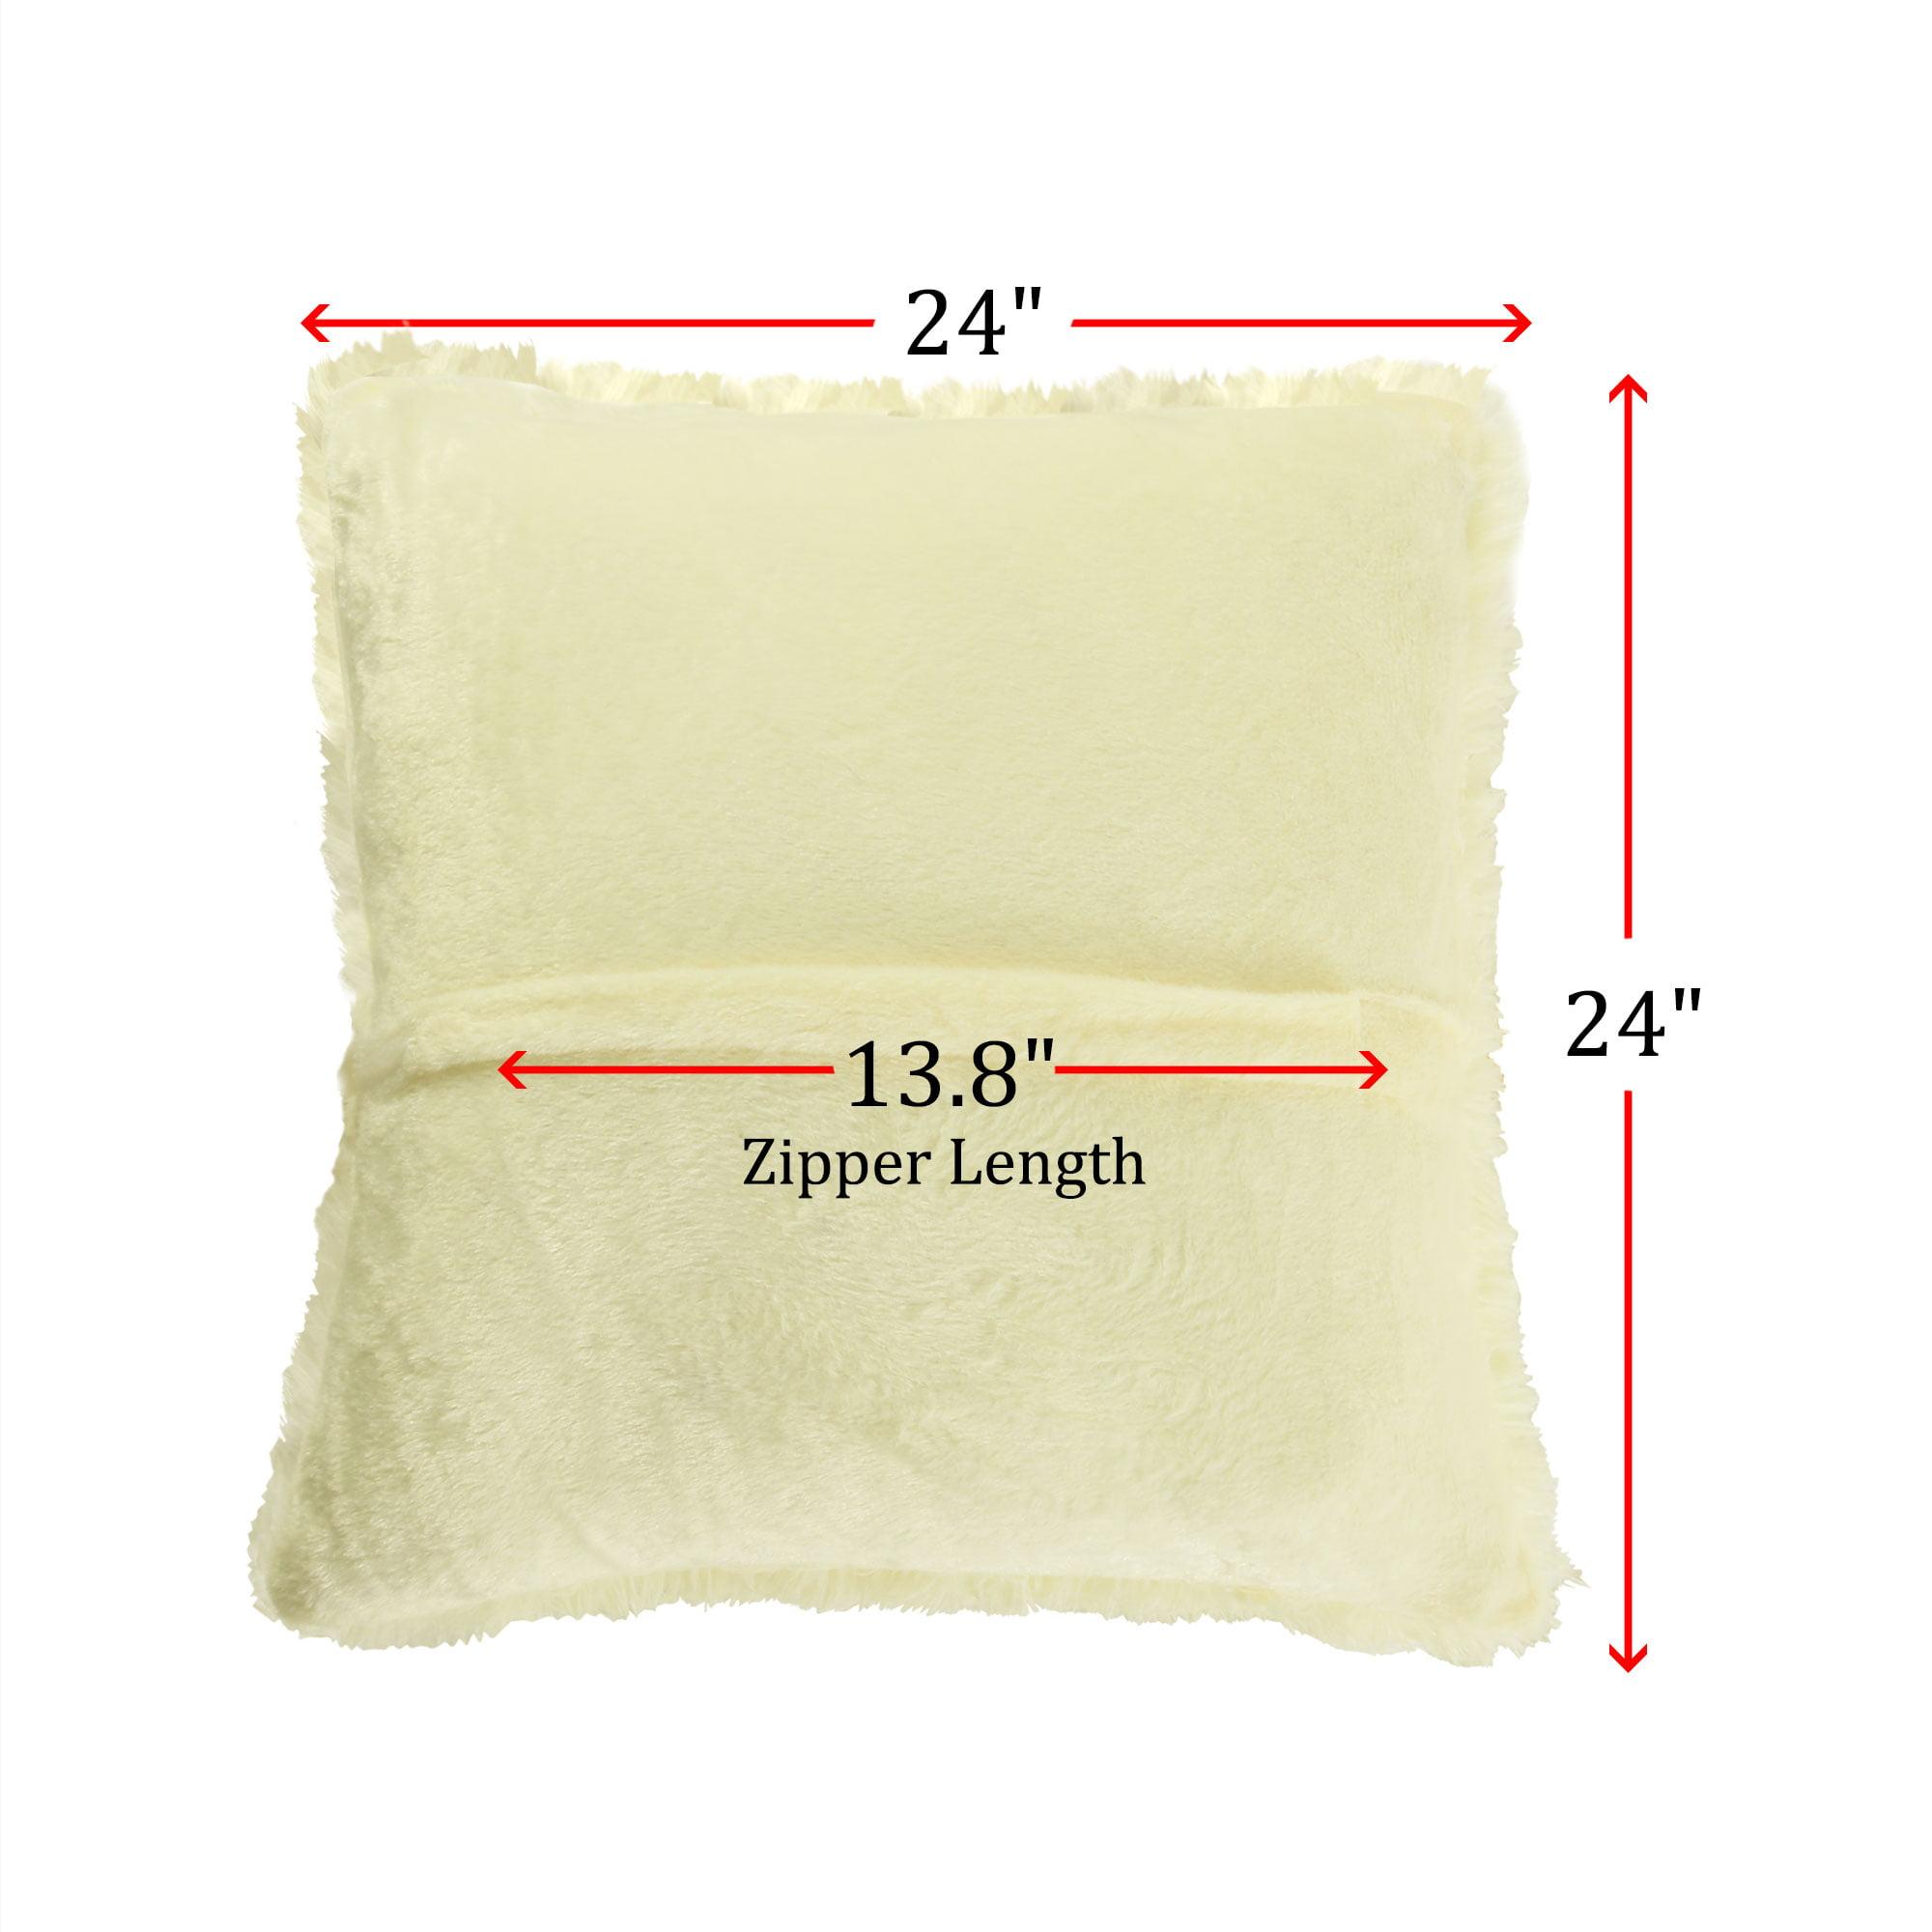 "24"" Throw Pillow Case Faux Fur Fuzzy Cushion Cover Light Yellow - image 6 de 8"